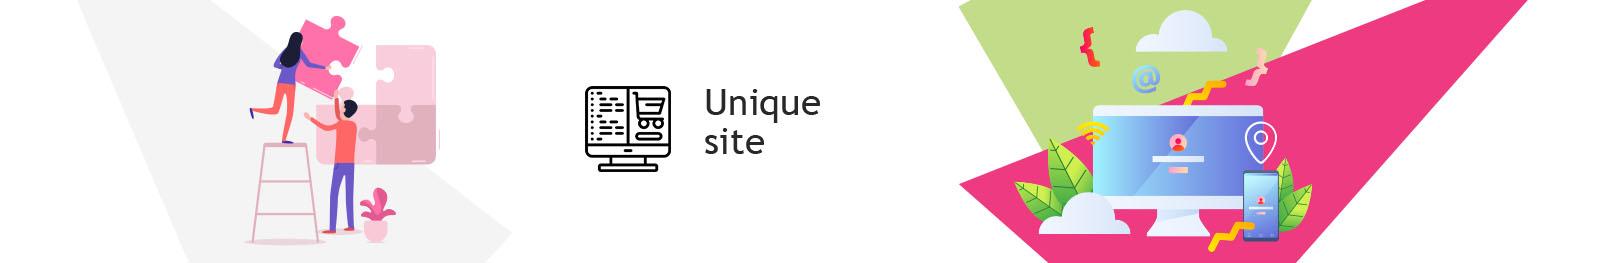 Unique site. Order a unique turnkey website, price, cost.